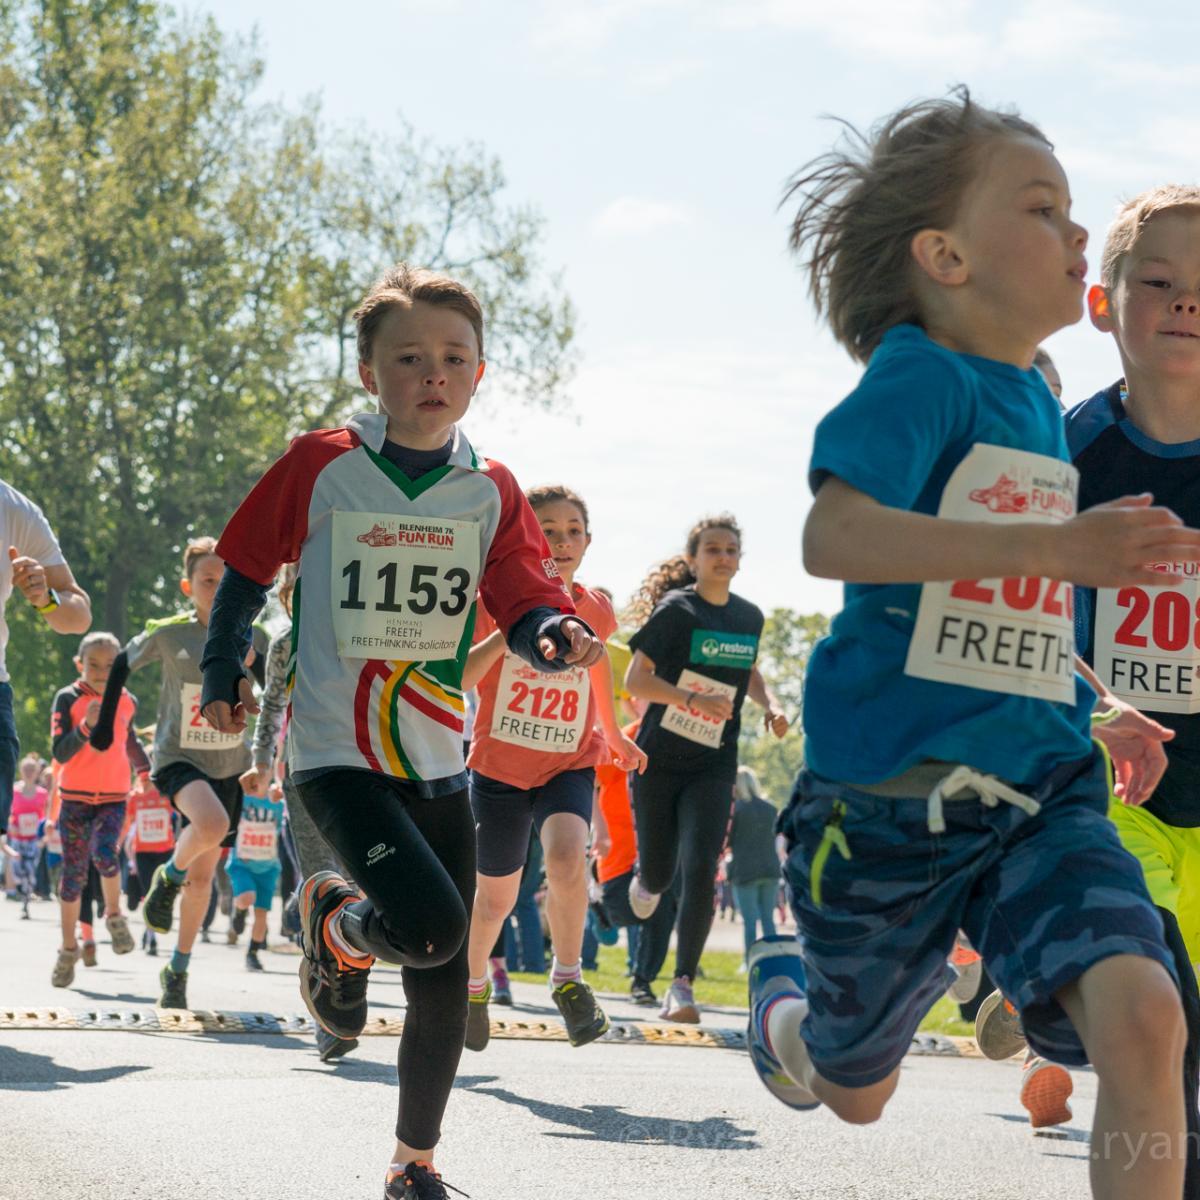 2021 Blenheim 7K Fun Run - Gallery Image 02